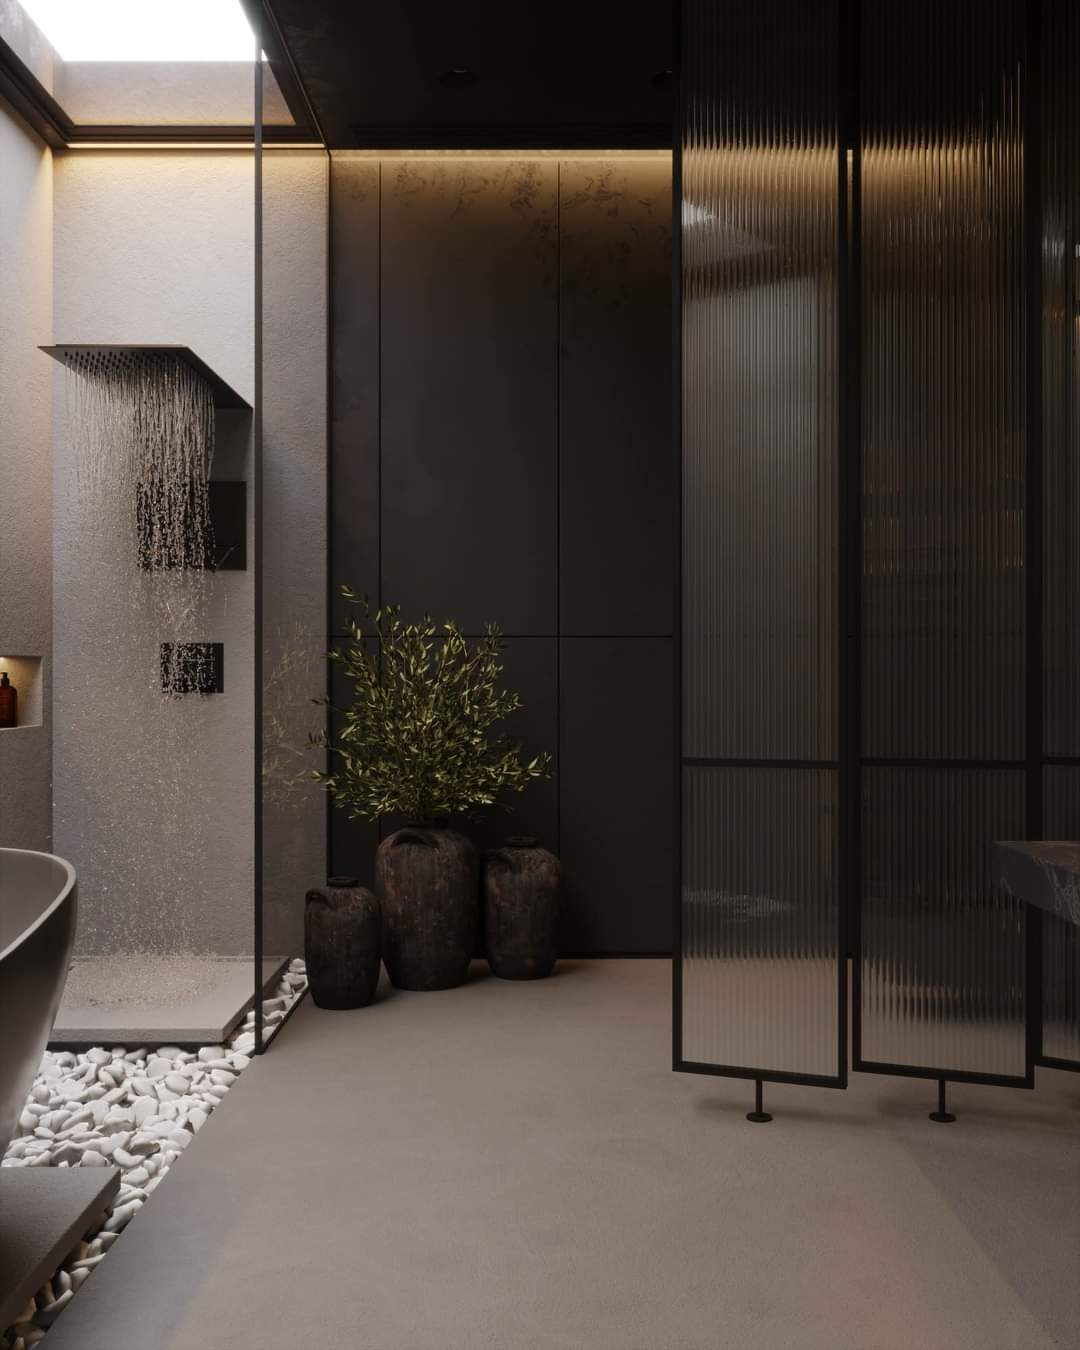 Alluring Bathroom Set Up - Source: Kireevaaanna